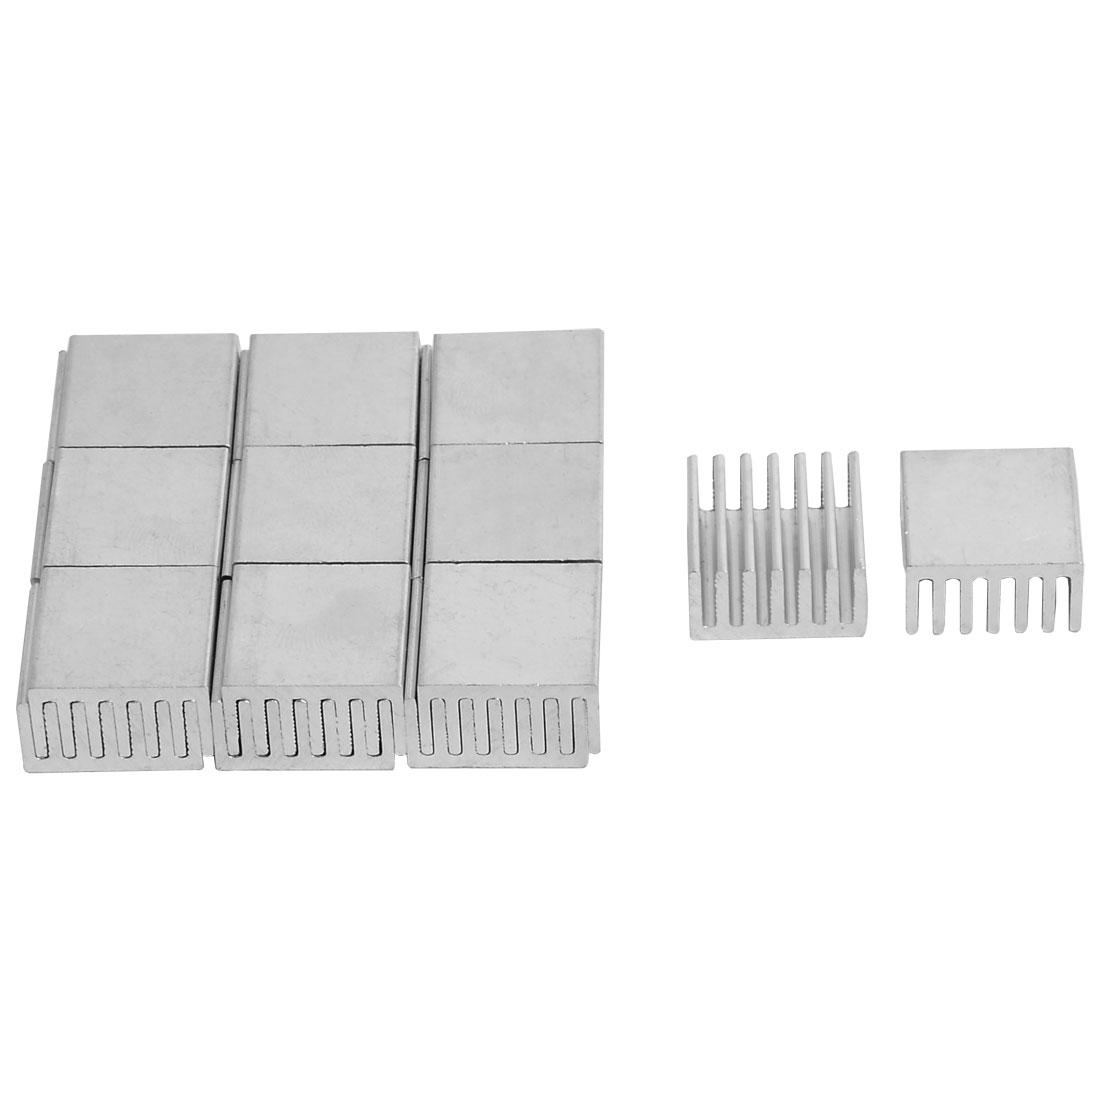 Aluminium Heatsink Cooling Fin Cooler Silver Tone 18mm x 19mm x 10mm 20 Pcs